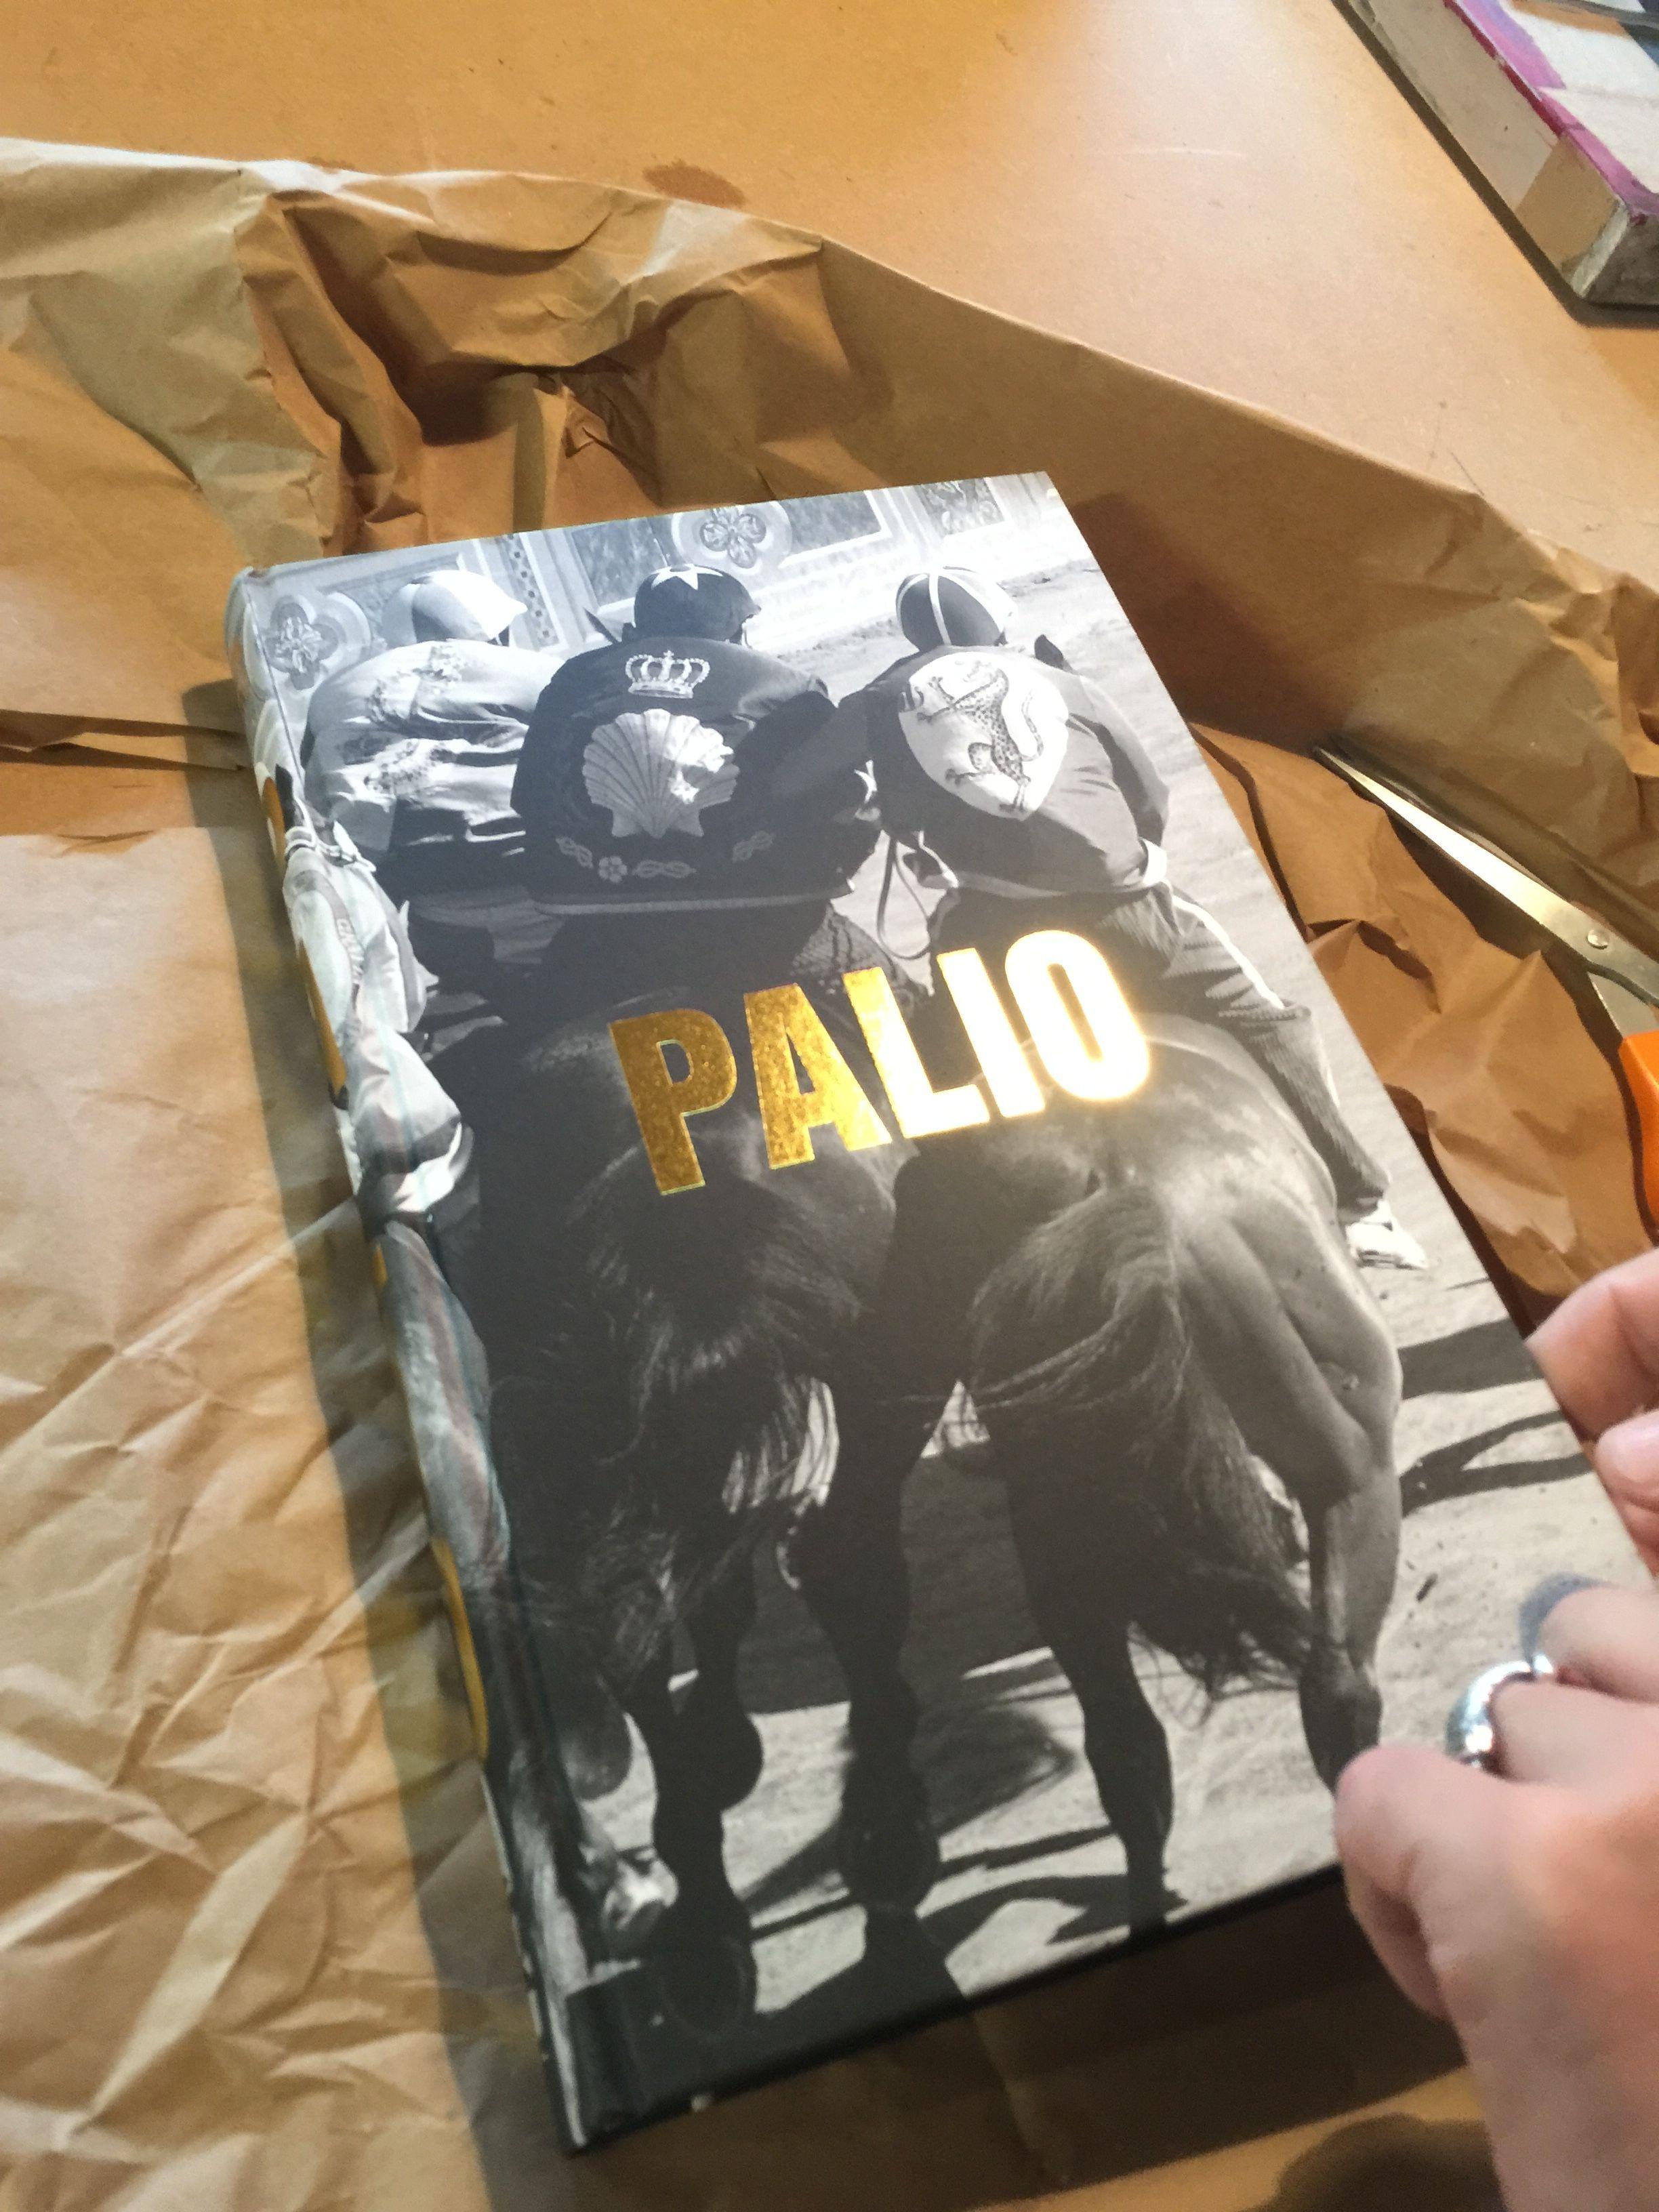 Palio book cover.jpg